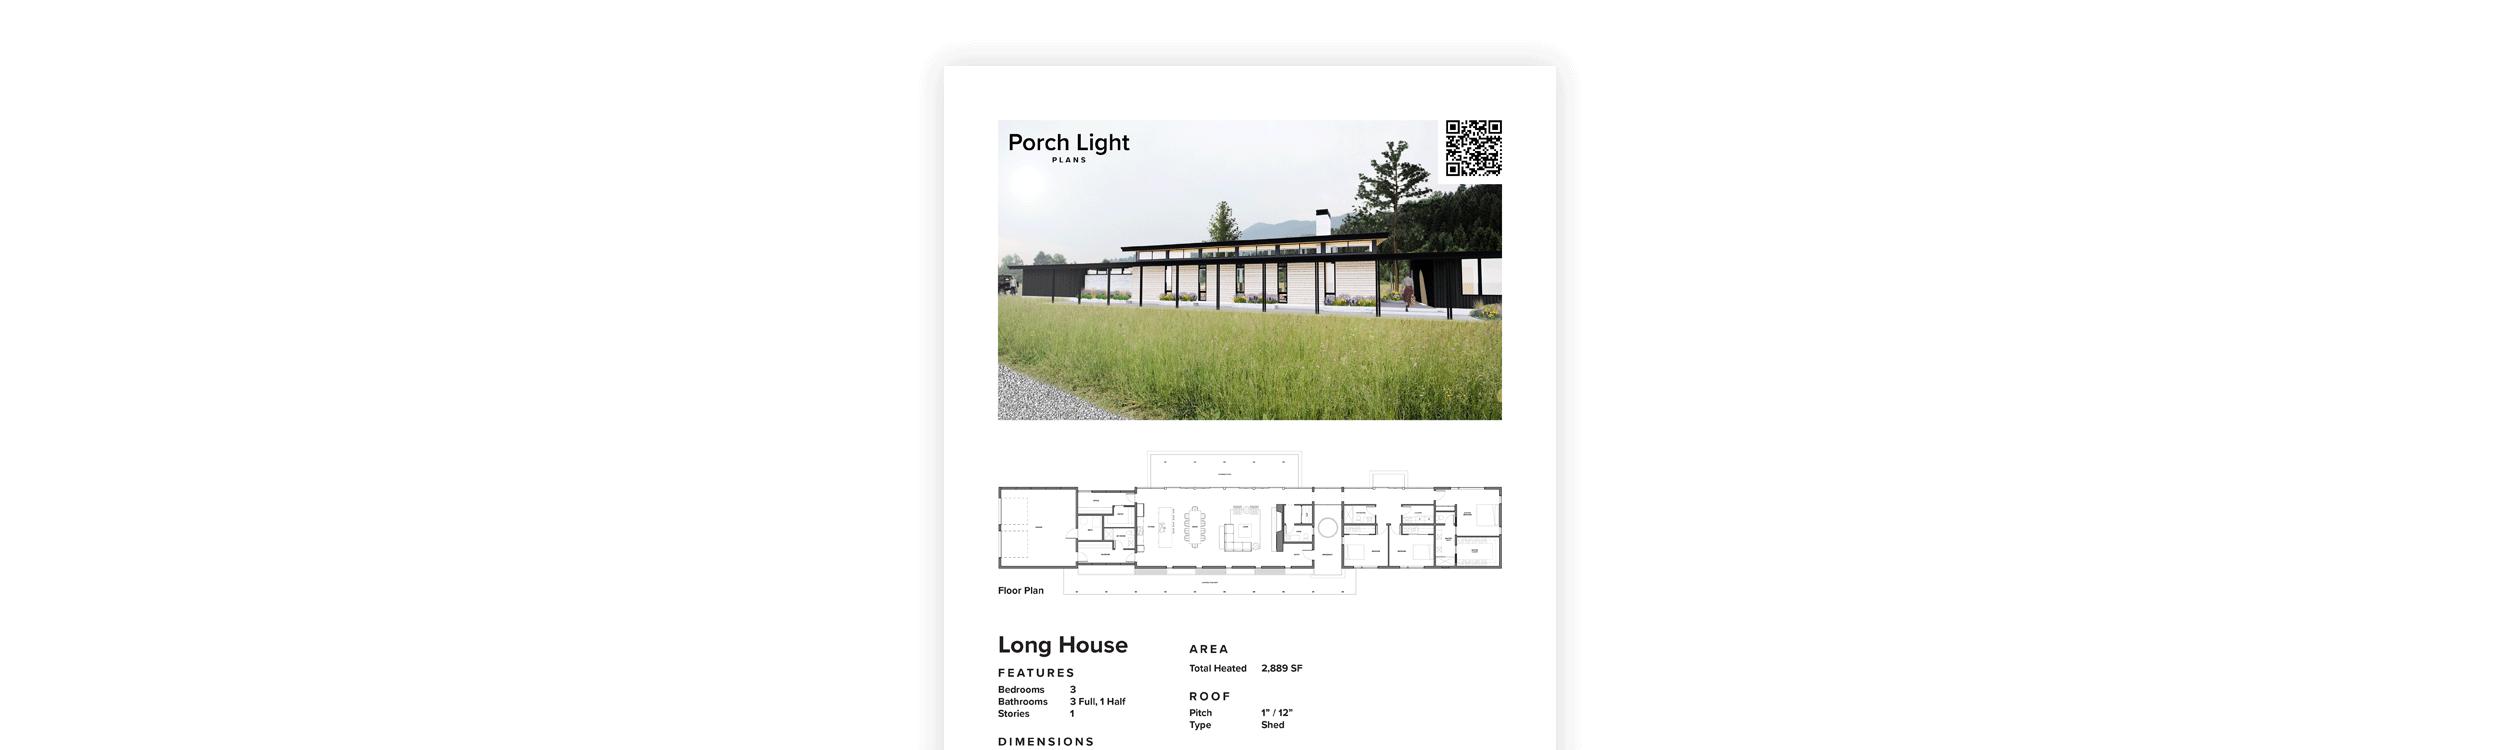 long-house-tear-sheet.png